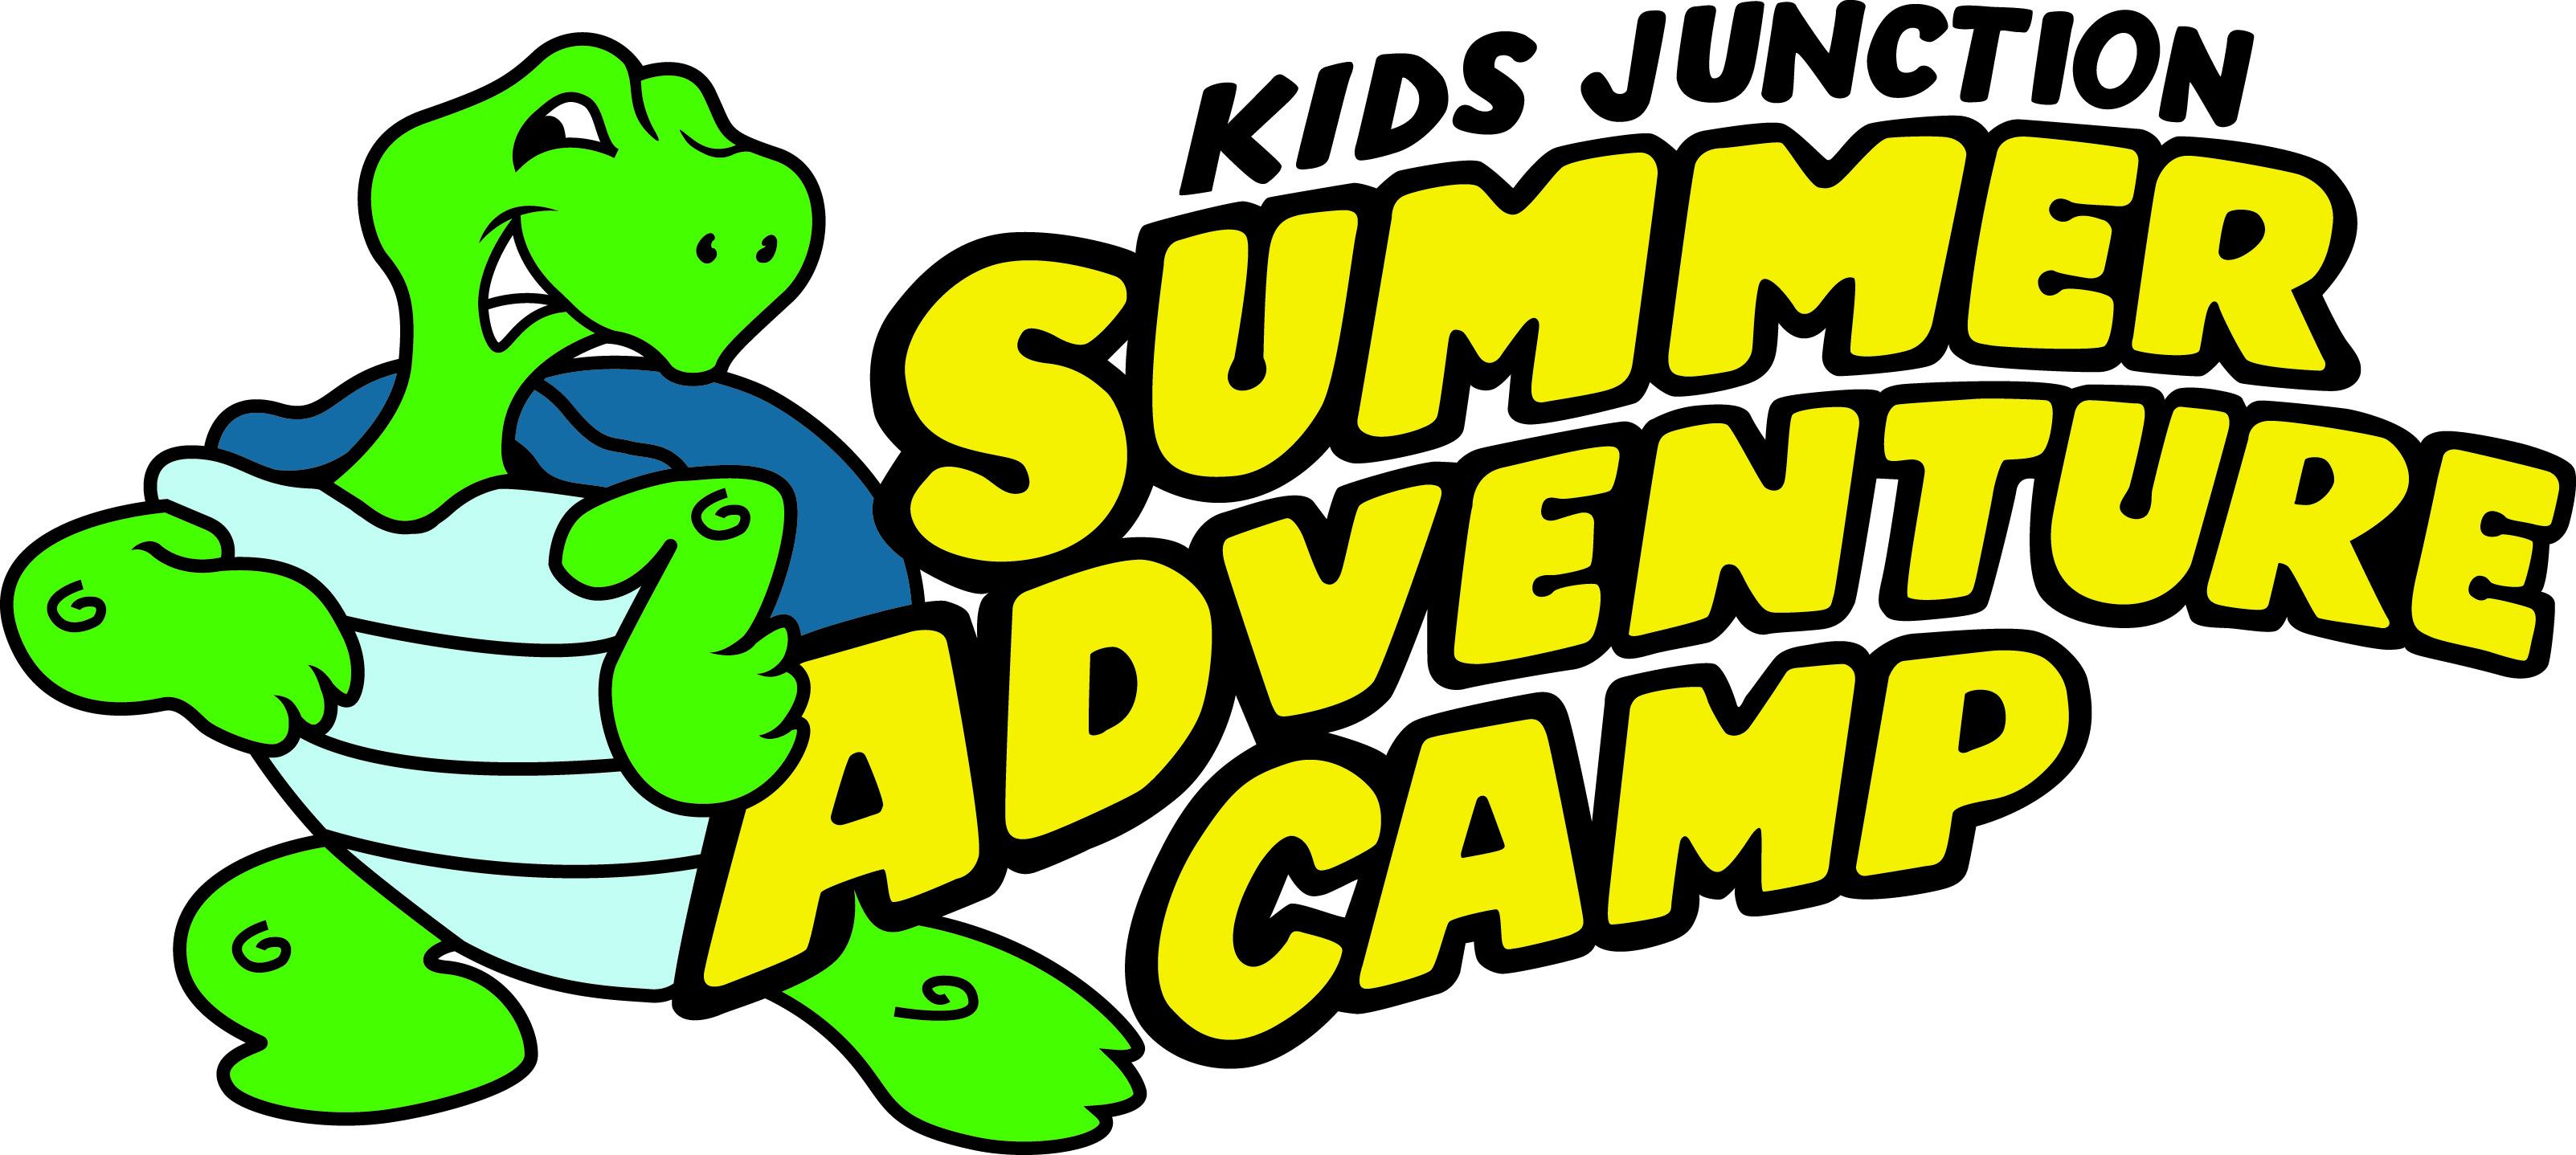 Adventure clipart school camp Camp Camp School area Summer